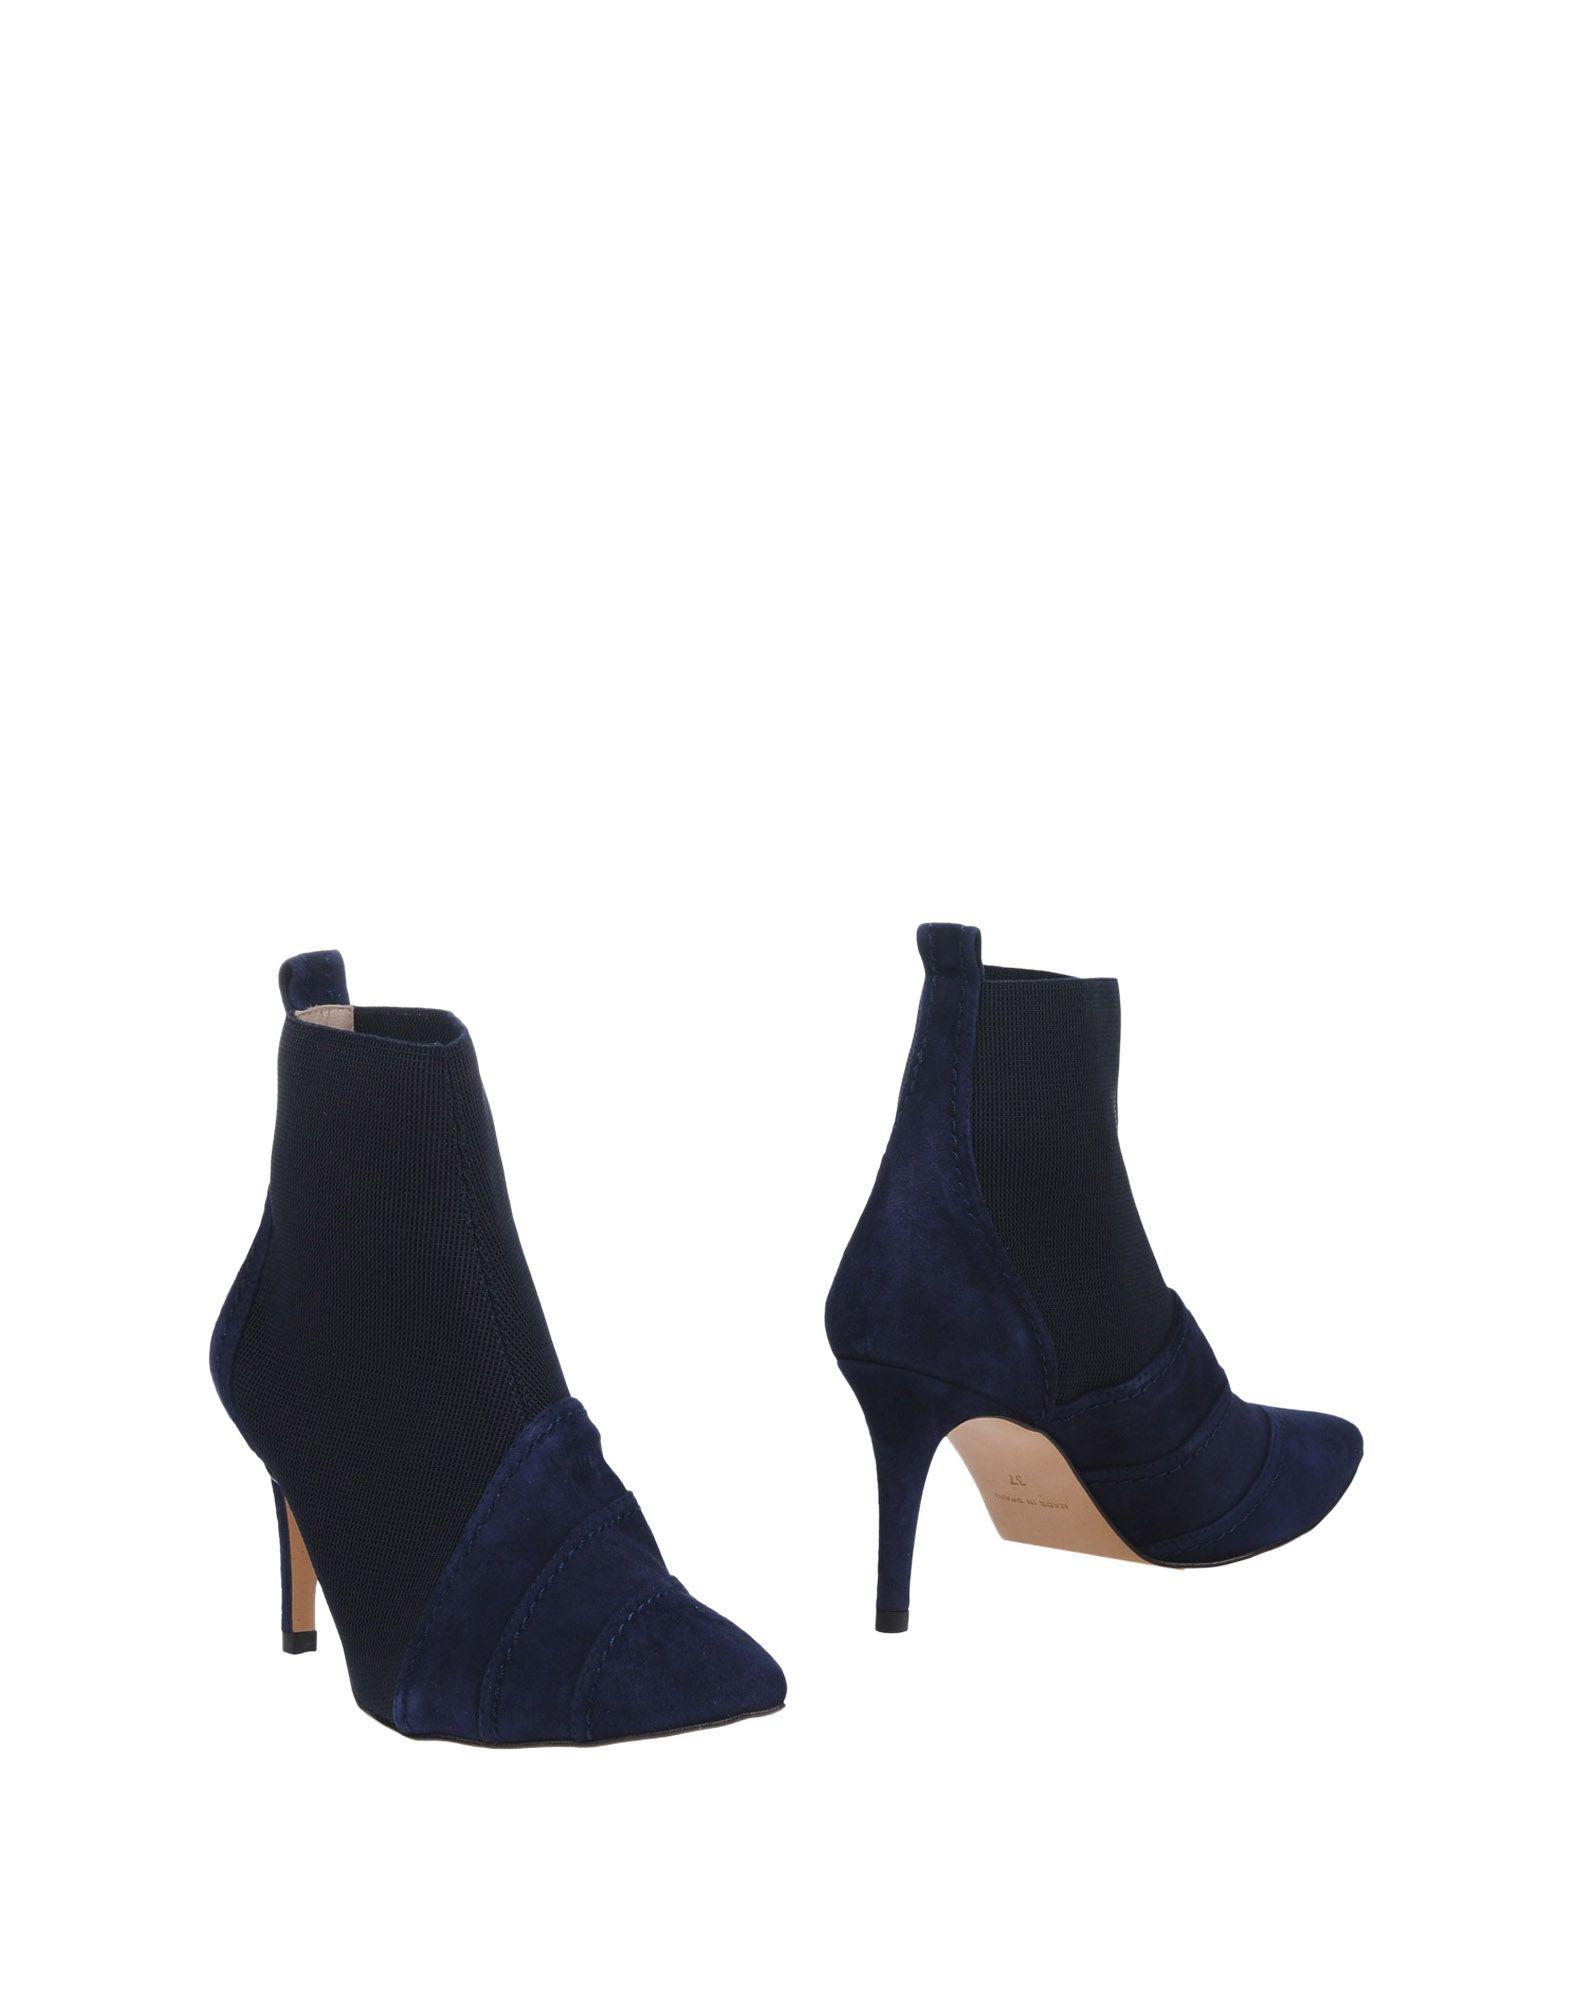 Ancarani Stiefelette Damen  11226647LE Schuhe Gute Qualität beliebte Schuhe 11226647LE 95e78a